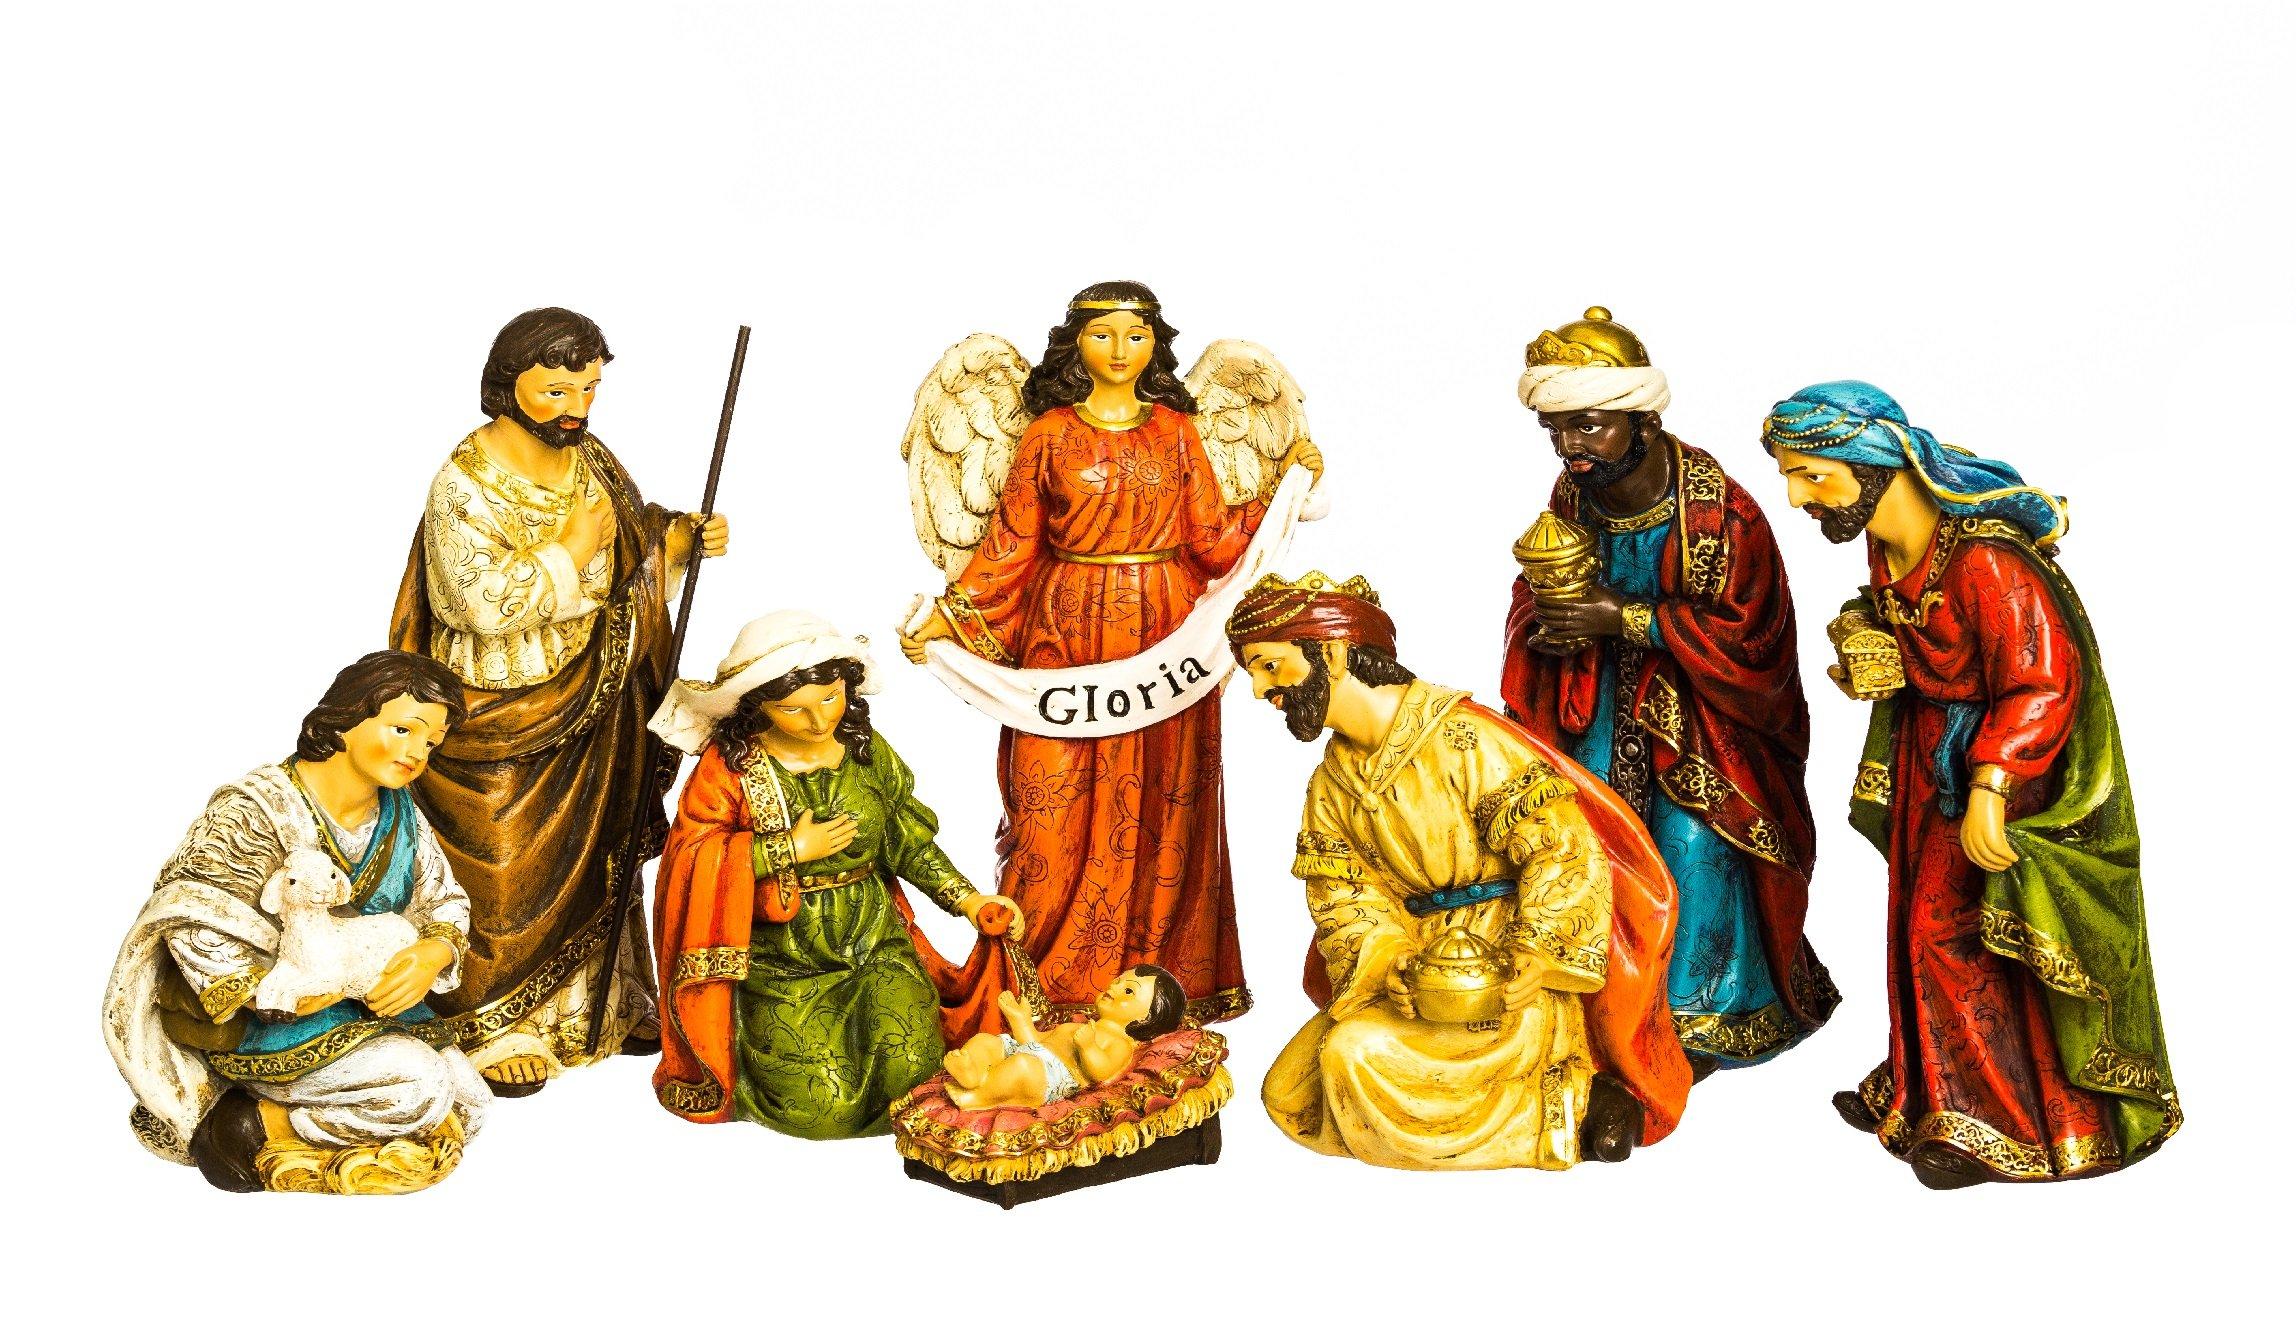 Evergreen 8-Piece Gloria Golden Flourish Outdoor-Safe Nativity Set by Evergreen Flag & Garden